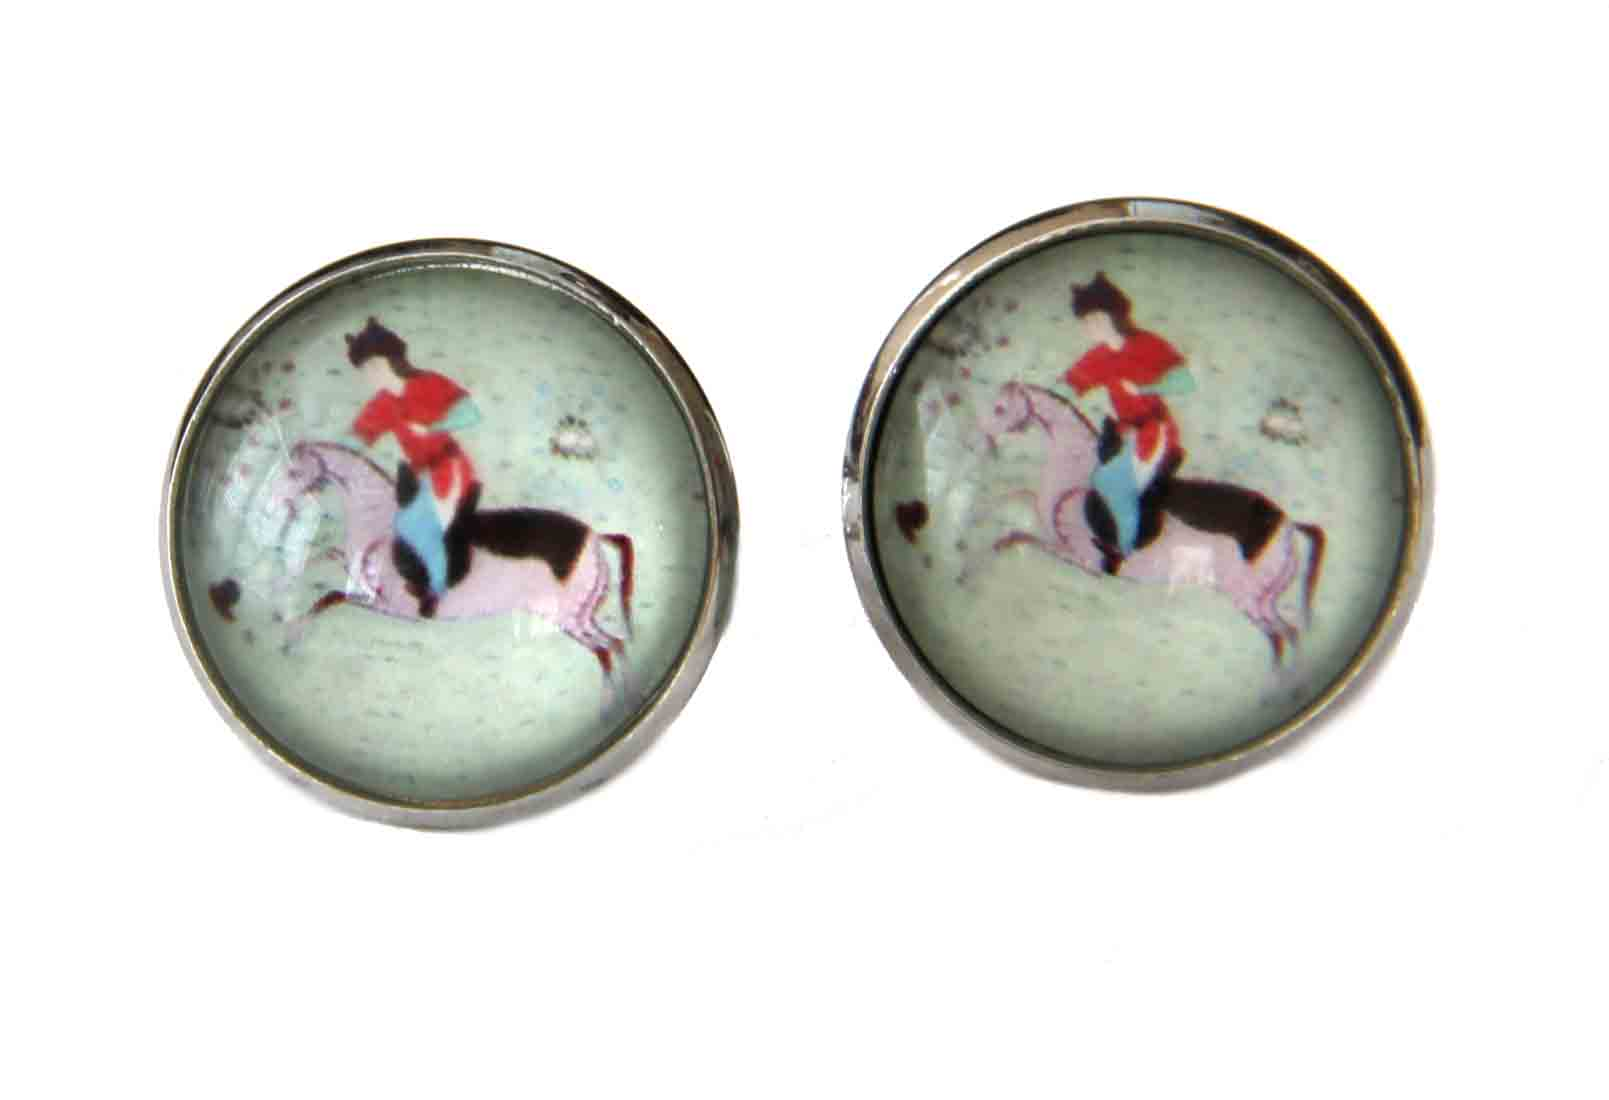 Gascoigne Cufflinks Ancient Polo Player Handmade Silver Metal Alloy Men's